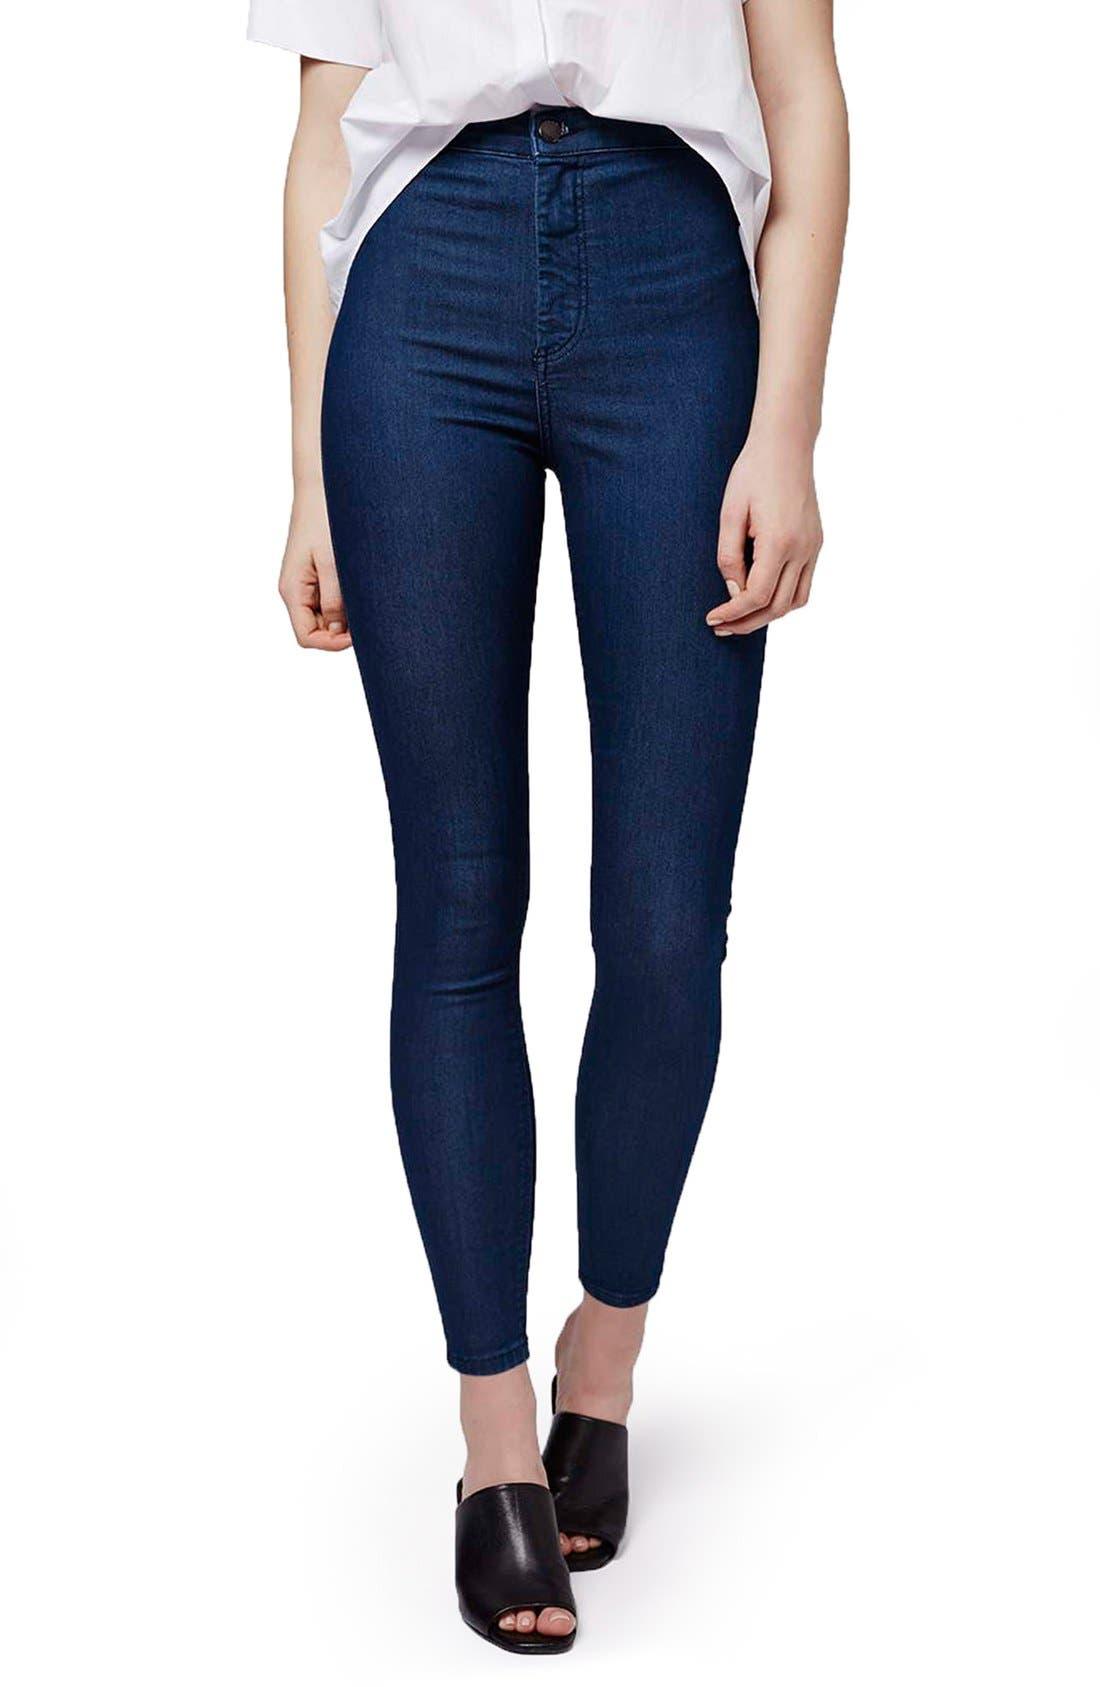 Main Image - Topshop 'Joni' Super Skinny Jeans (Petite)